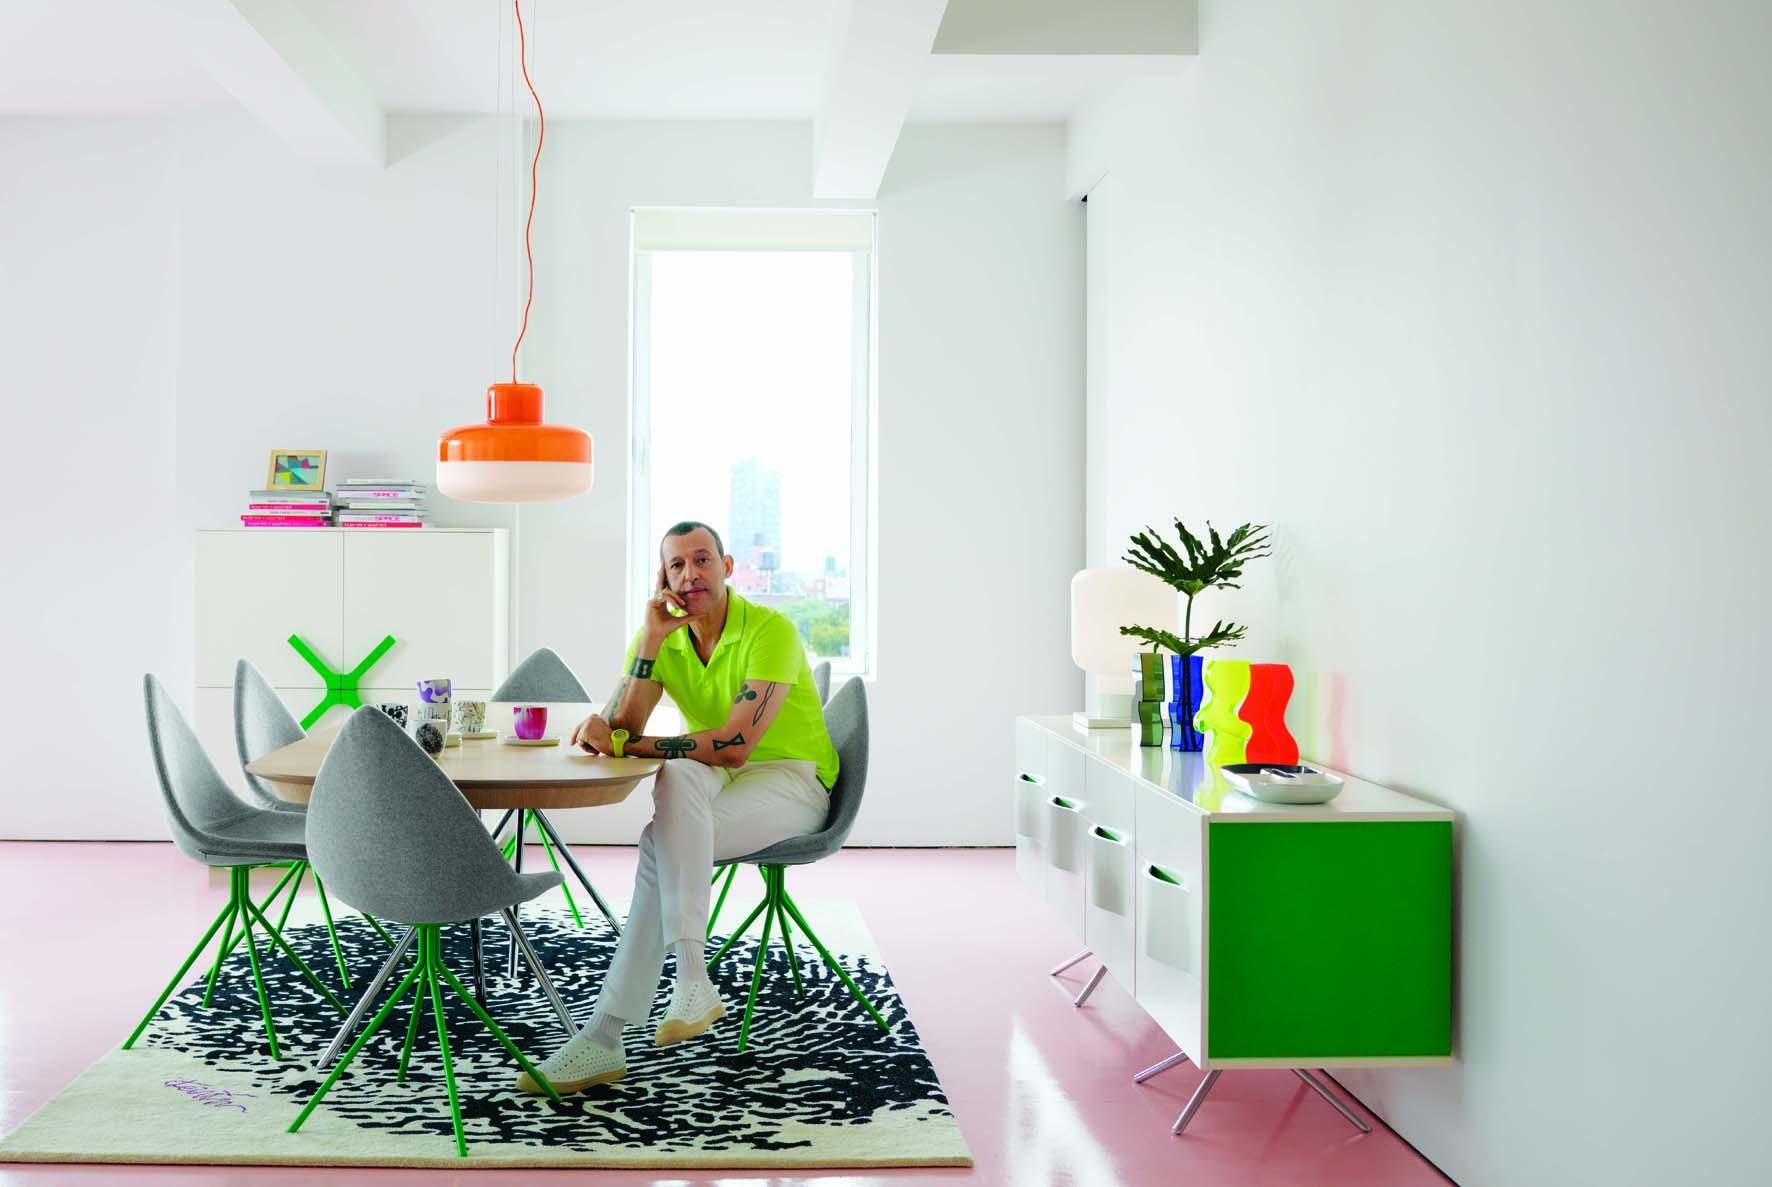 Collection de meubles boconcept 2012 ottawa par karim rashid for Meuble boconcept